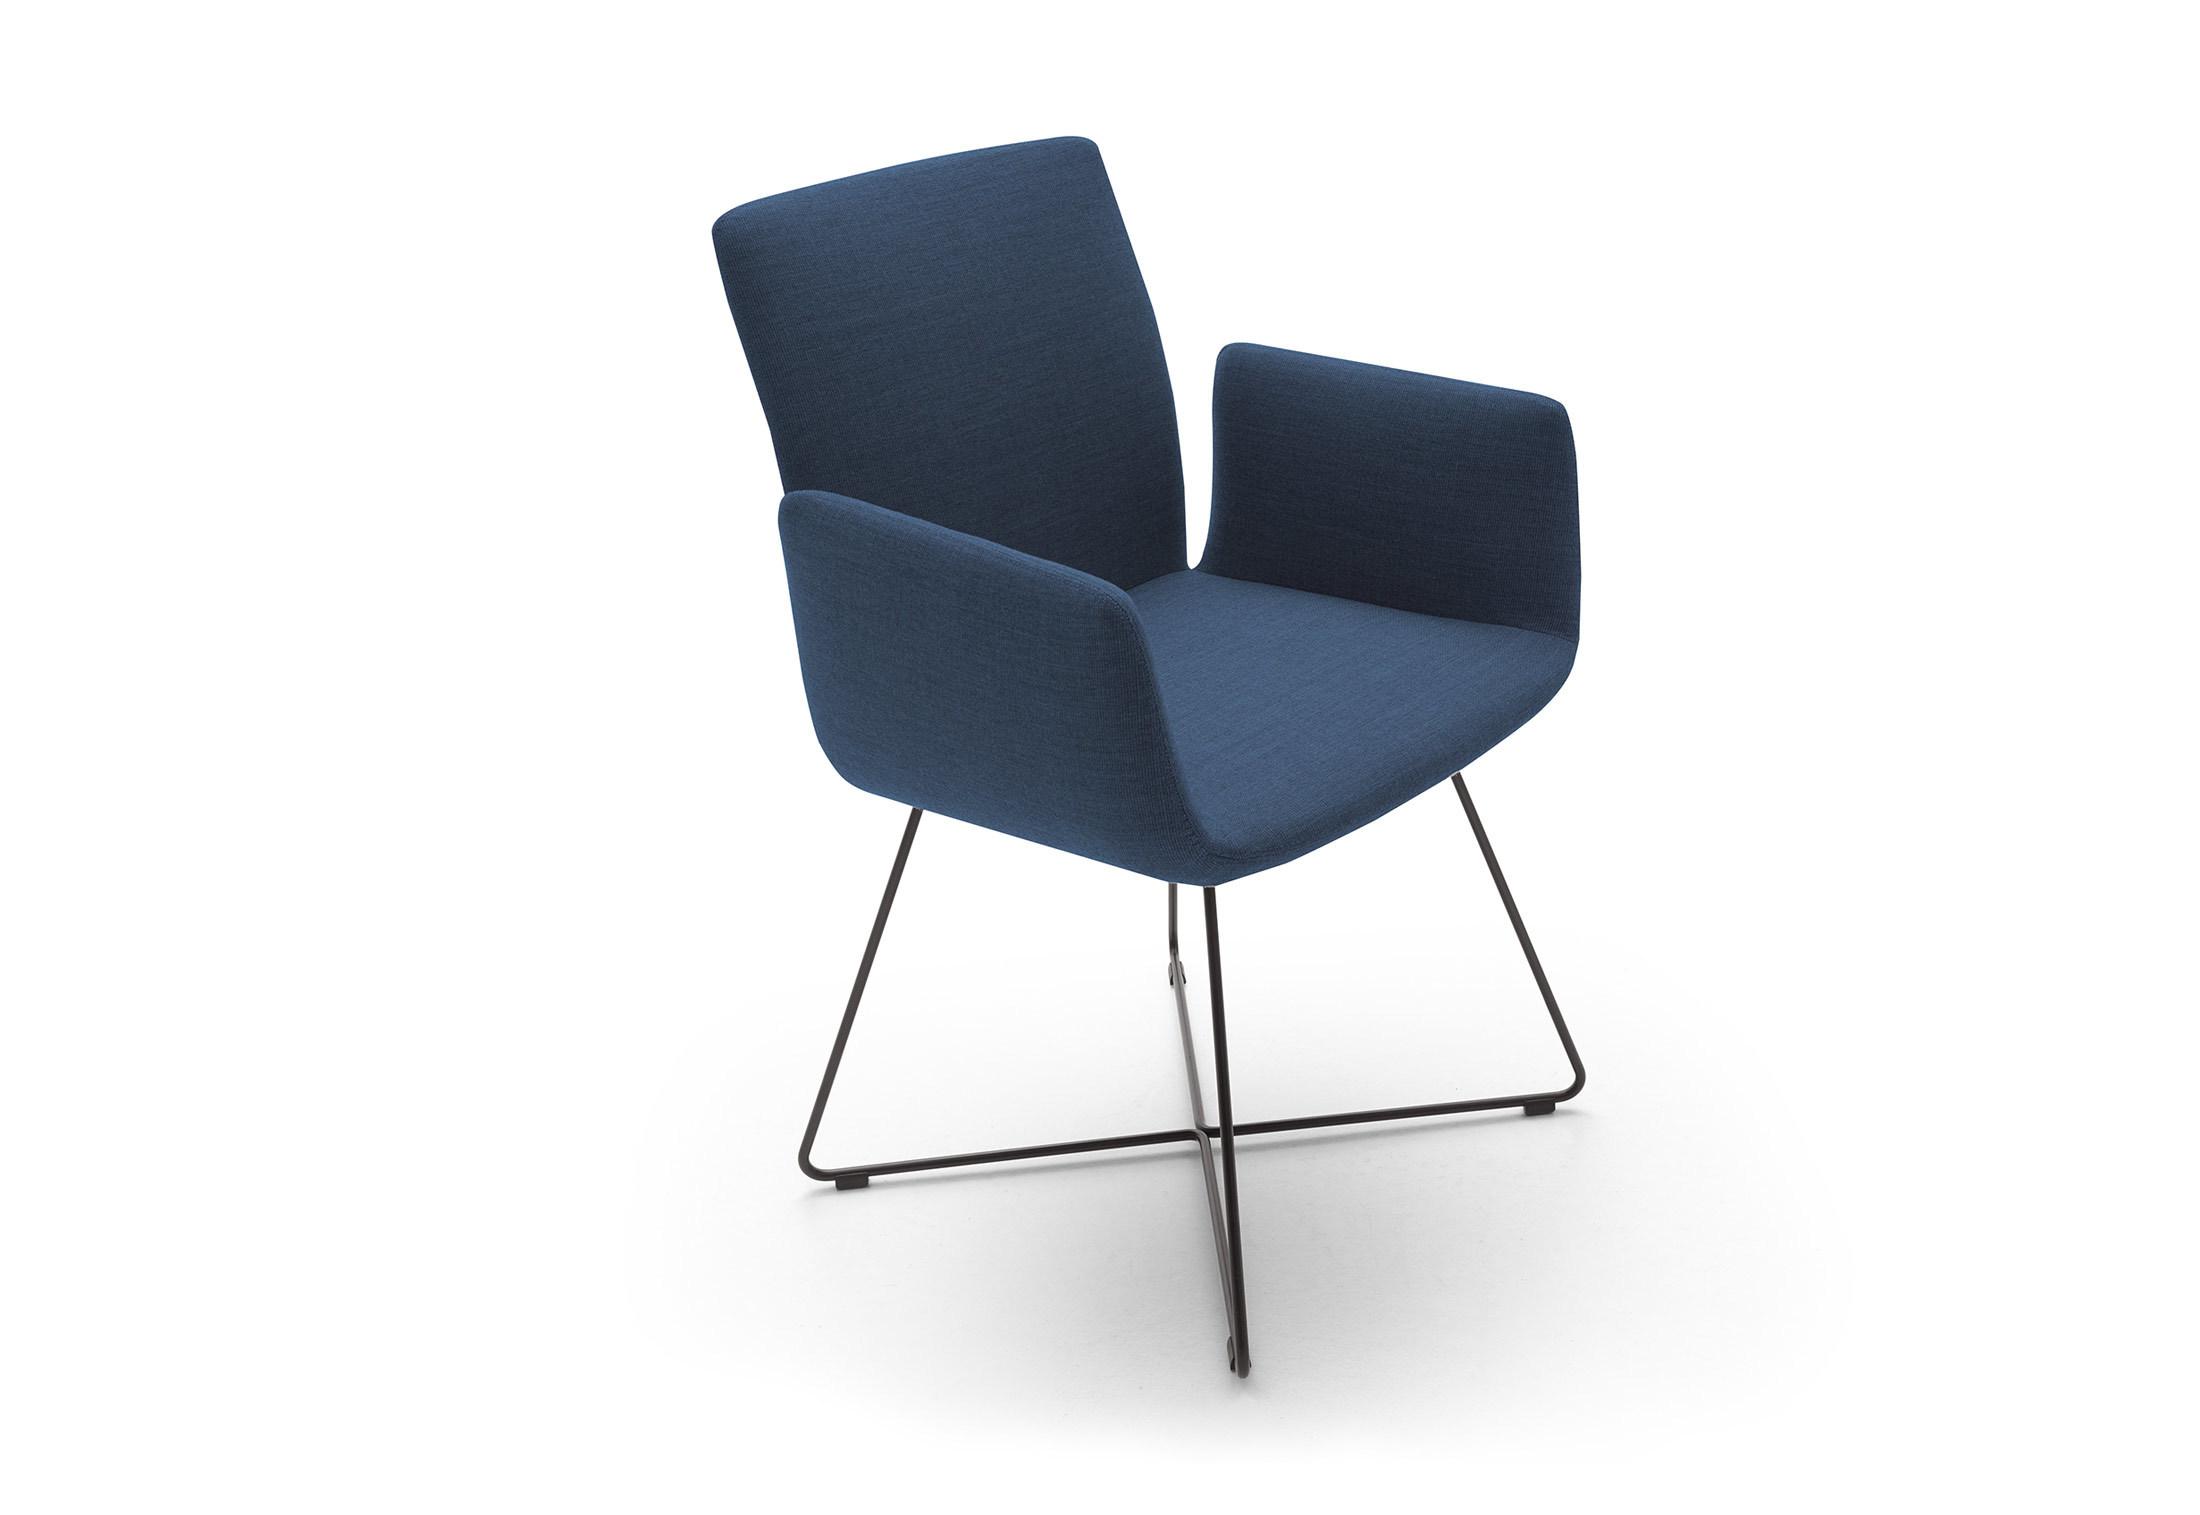 jalis stuhl mit drahtgestell von cor stylepark. Black Bedroom Furniture Sets. Home Design Ideas